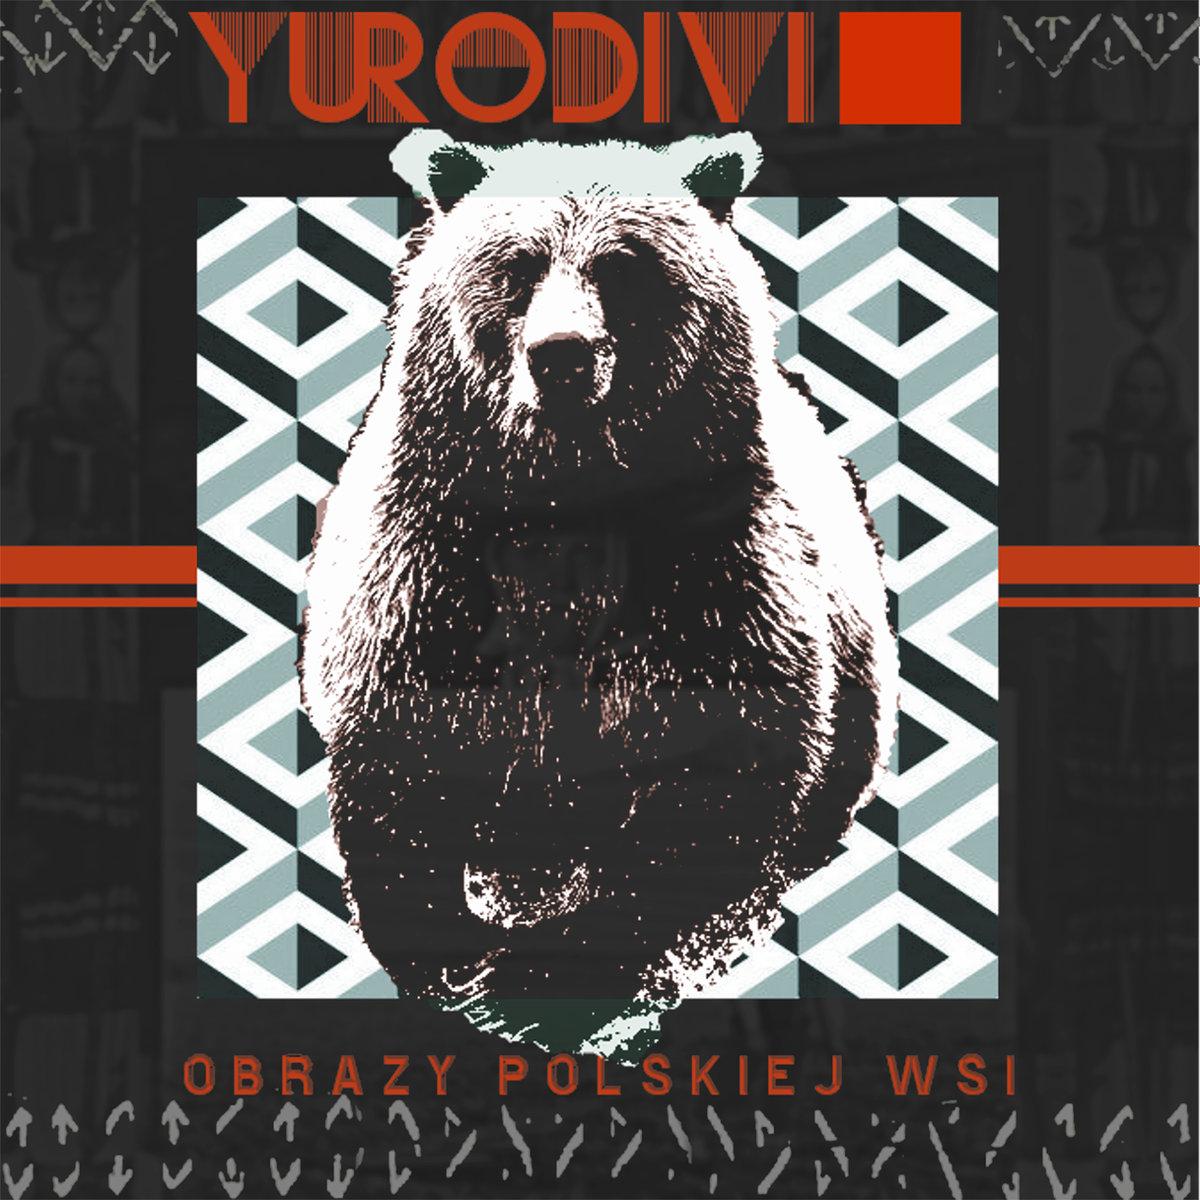 Yurodivi-Obrazy-polskiej-wsi